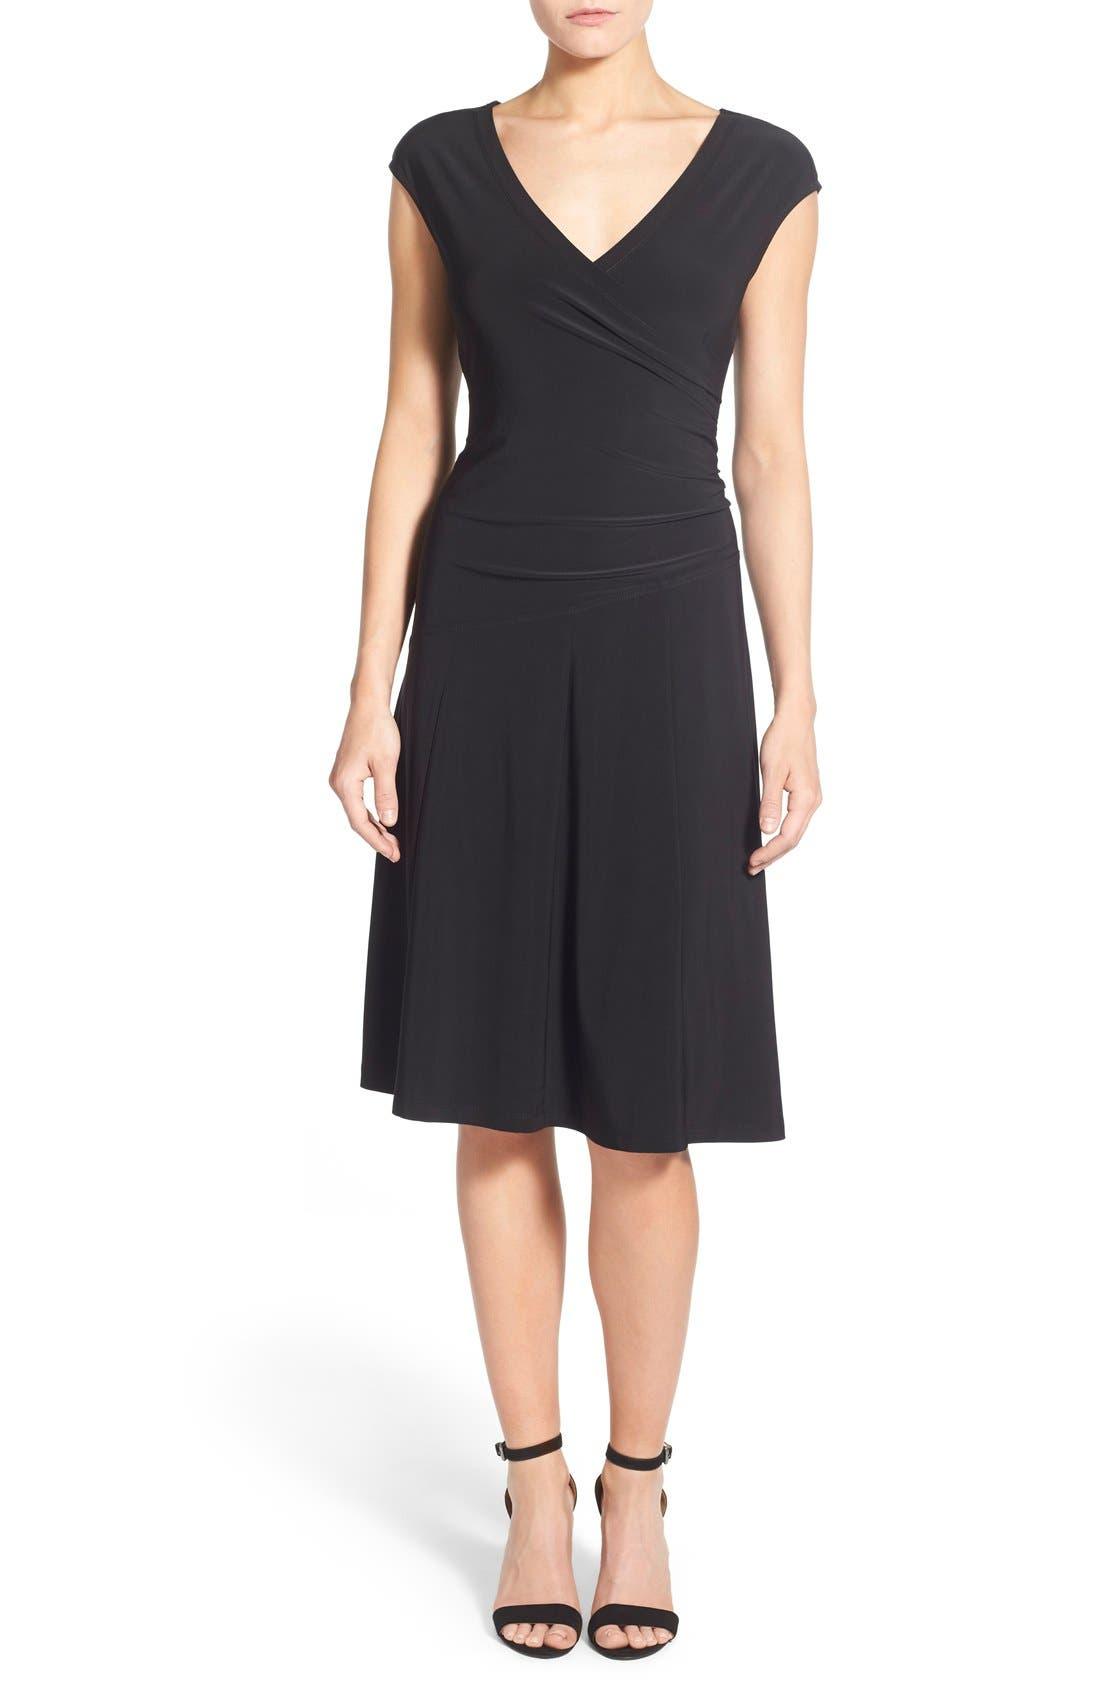 Main Image - NIC+ZOE Matte Jersey Faux Wrap Fit & Flare Dress